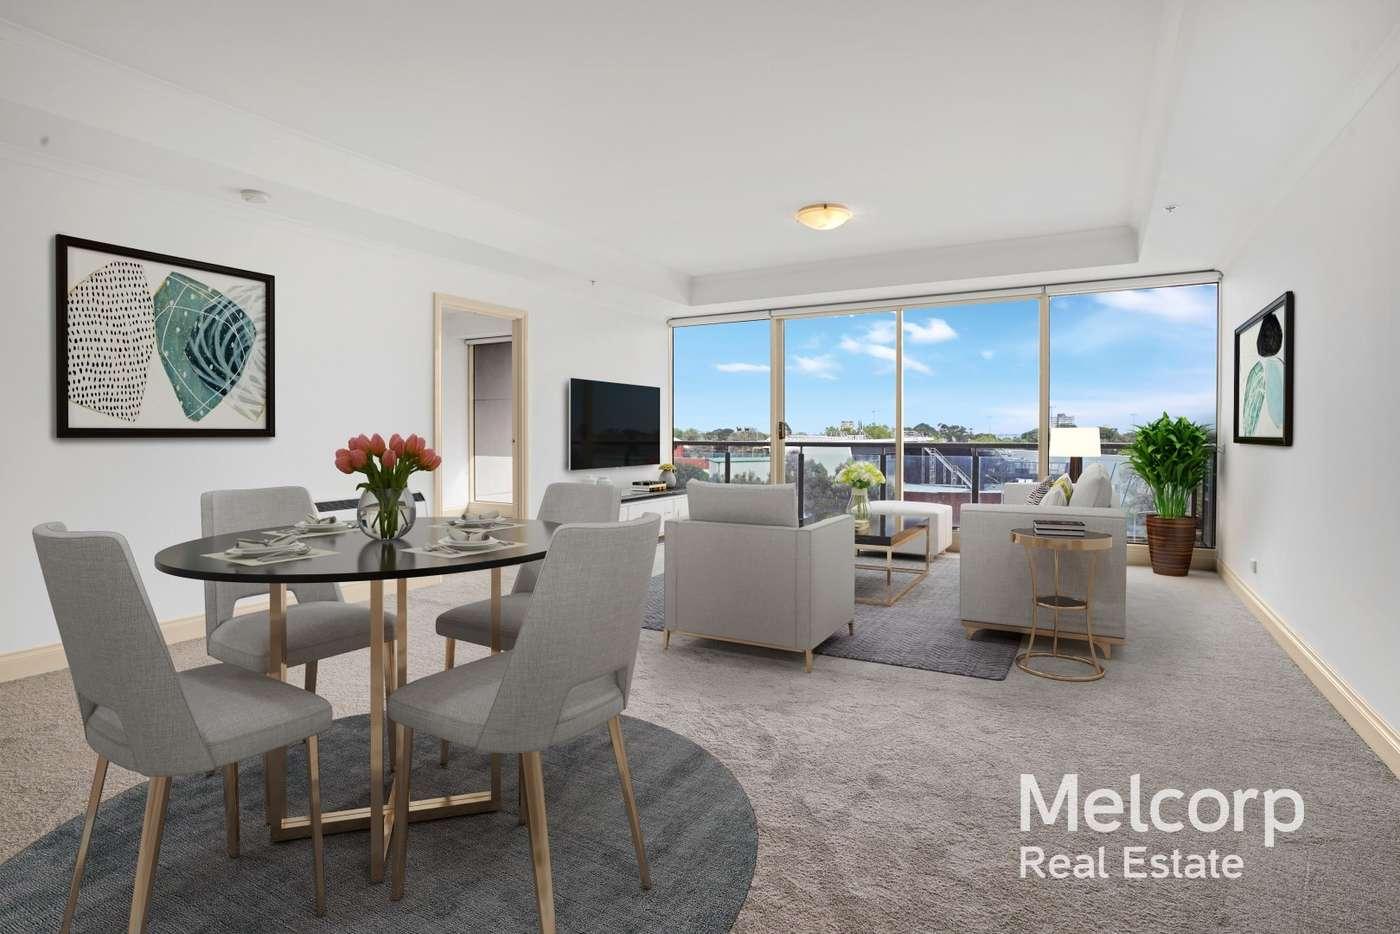 Main view of Homely apartment listing, 53/632 St Kilda Road, St Kilda VIC 3182